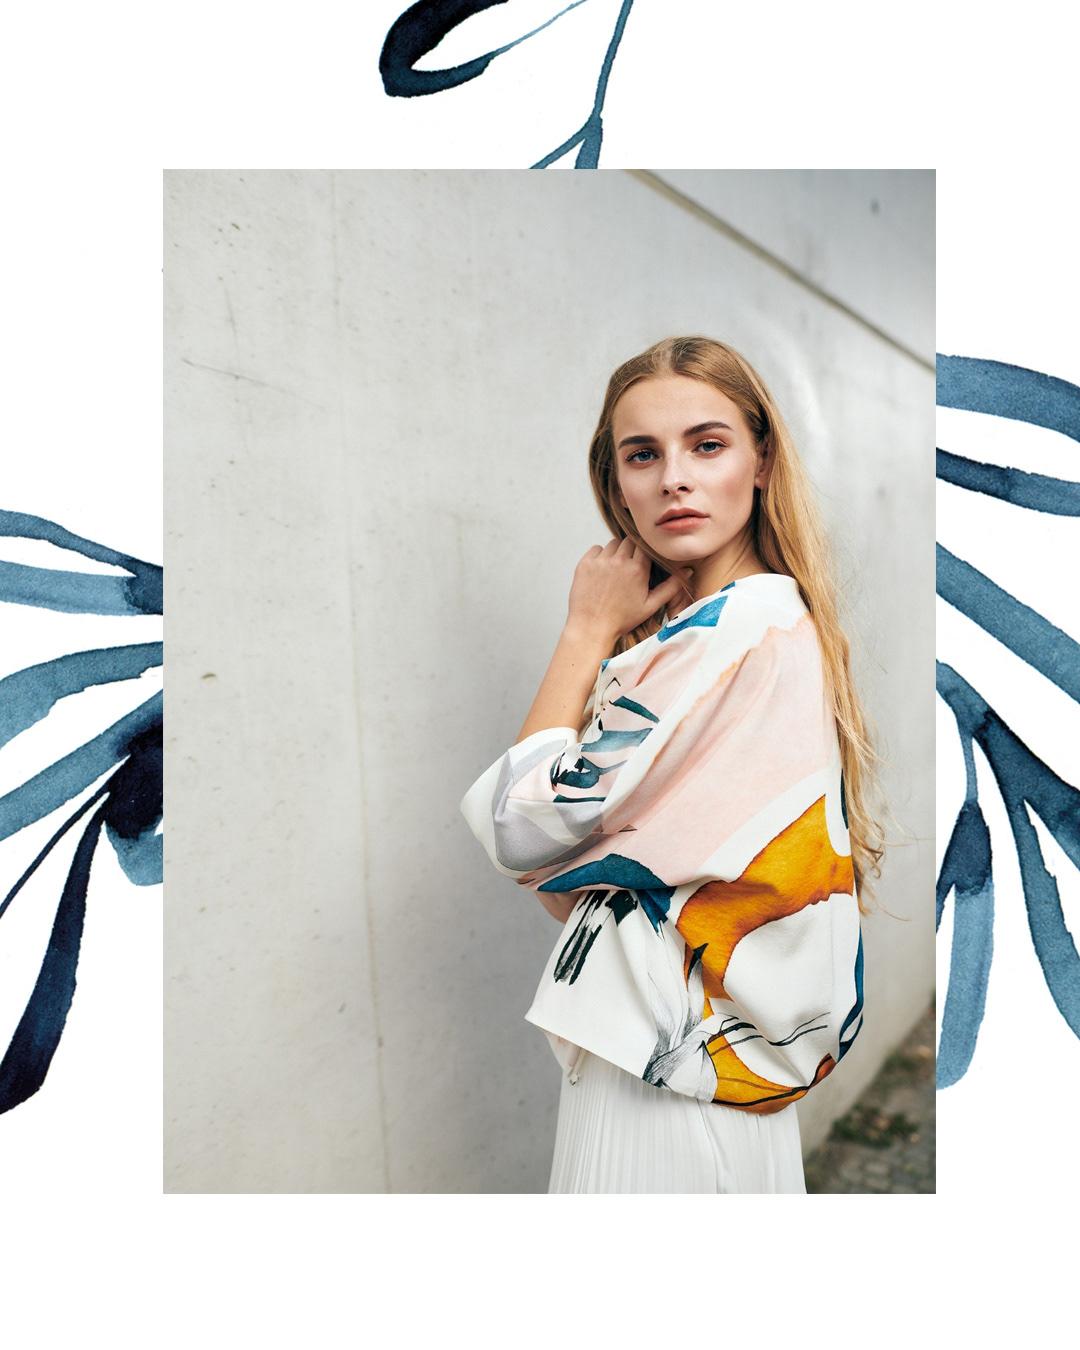 Collaboration customized fabricdesign fashiondesign fashionillustration ILLUSTRATION  printonfabric